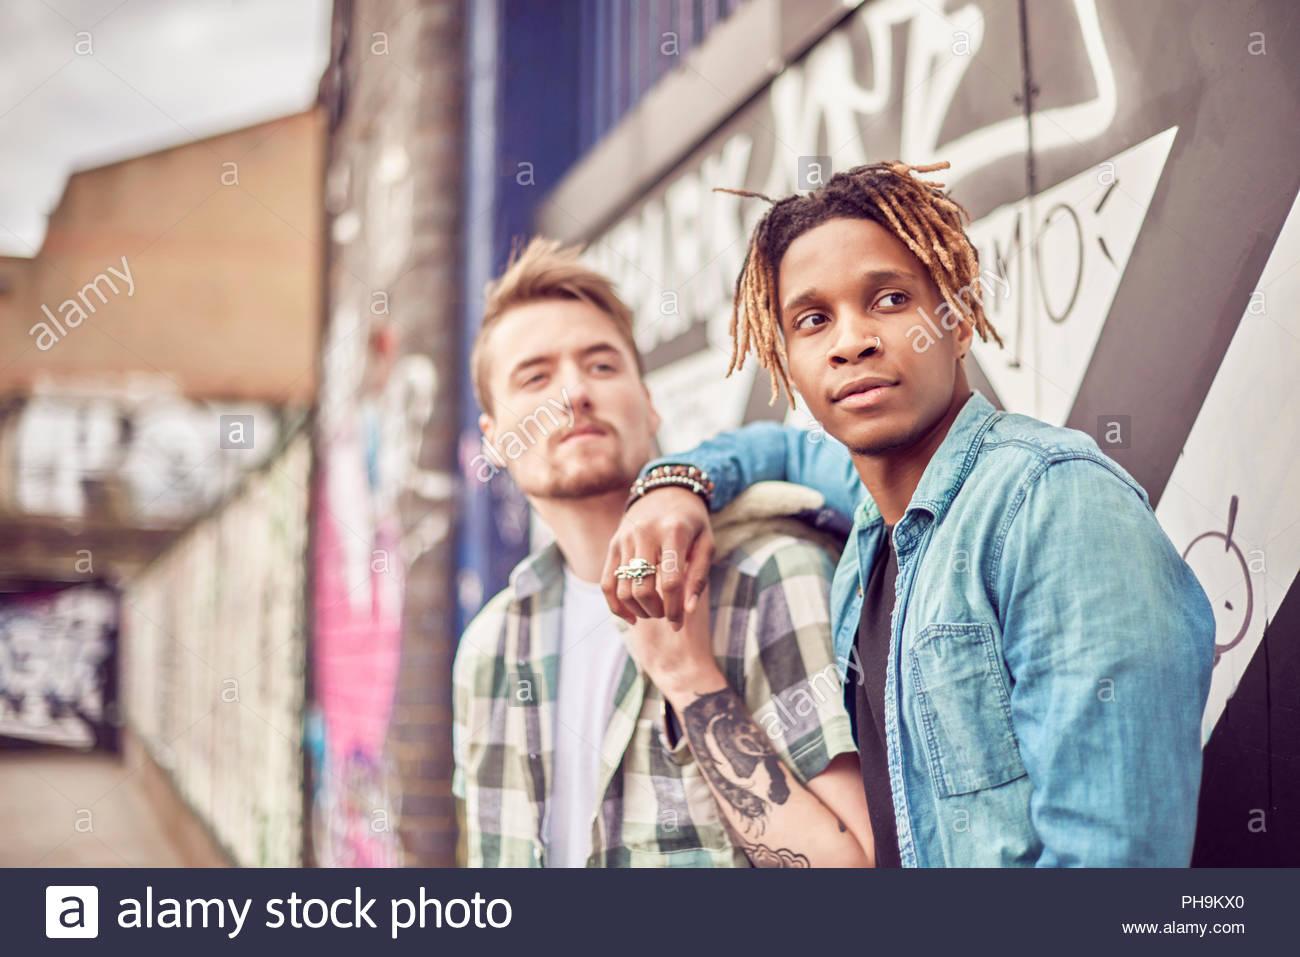 Teenage boys leaning on wall - Stock Image